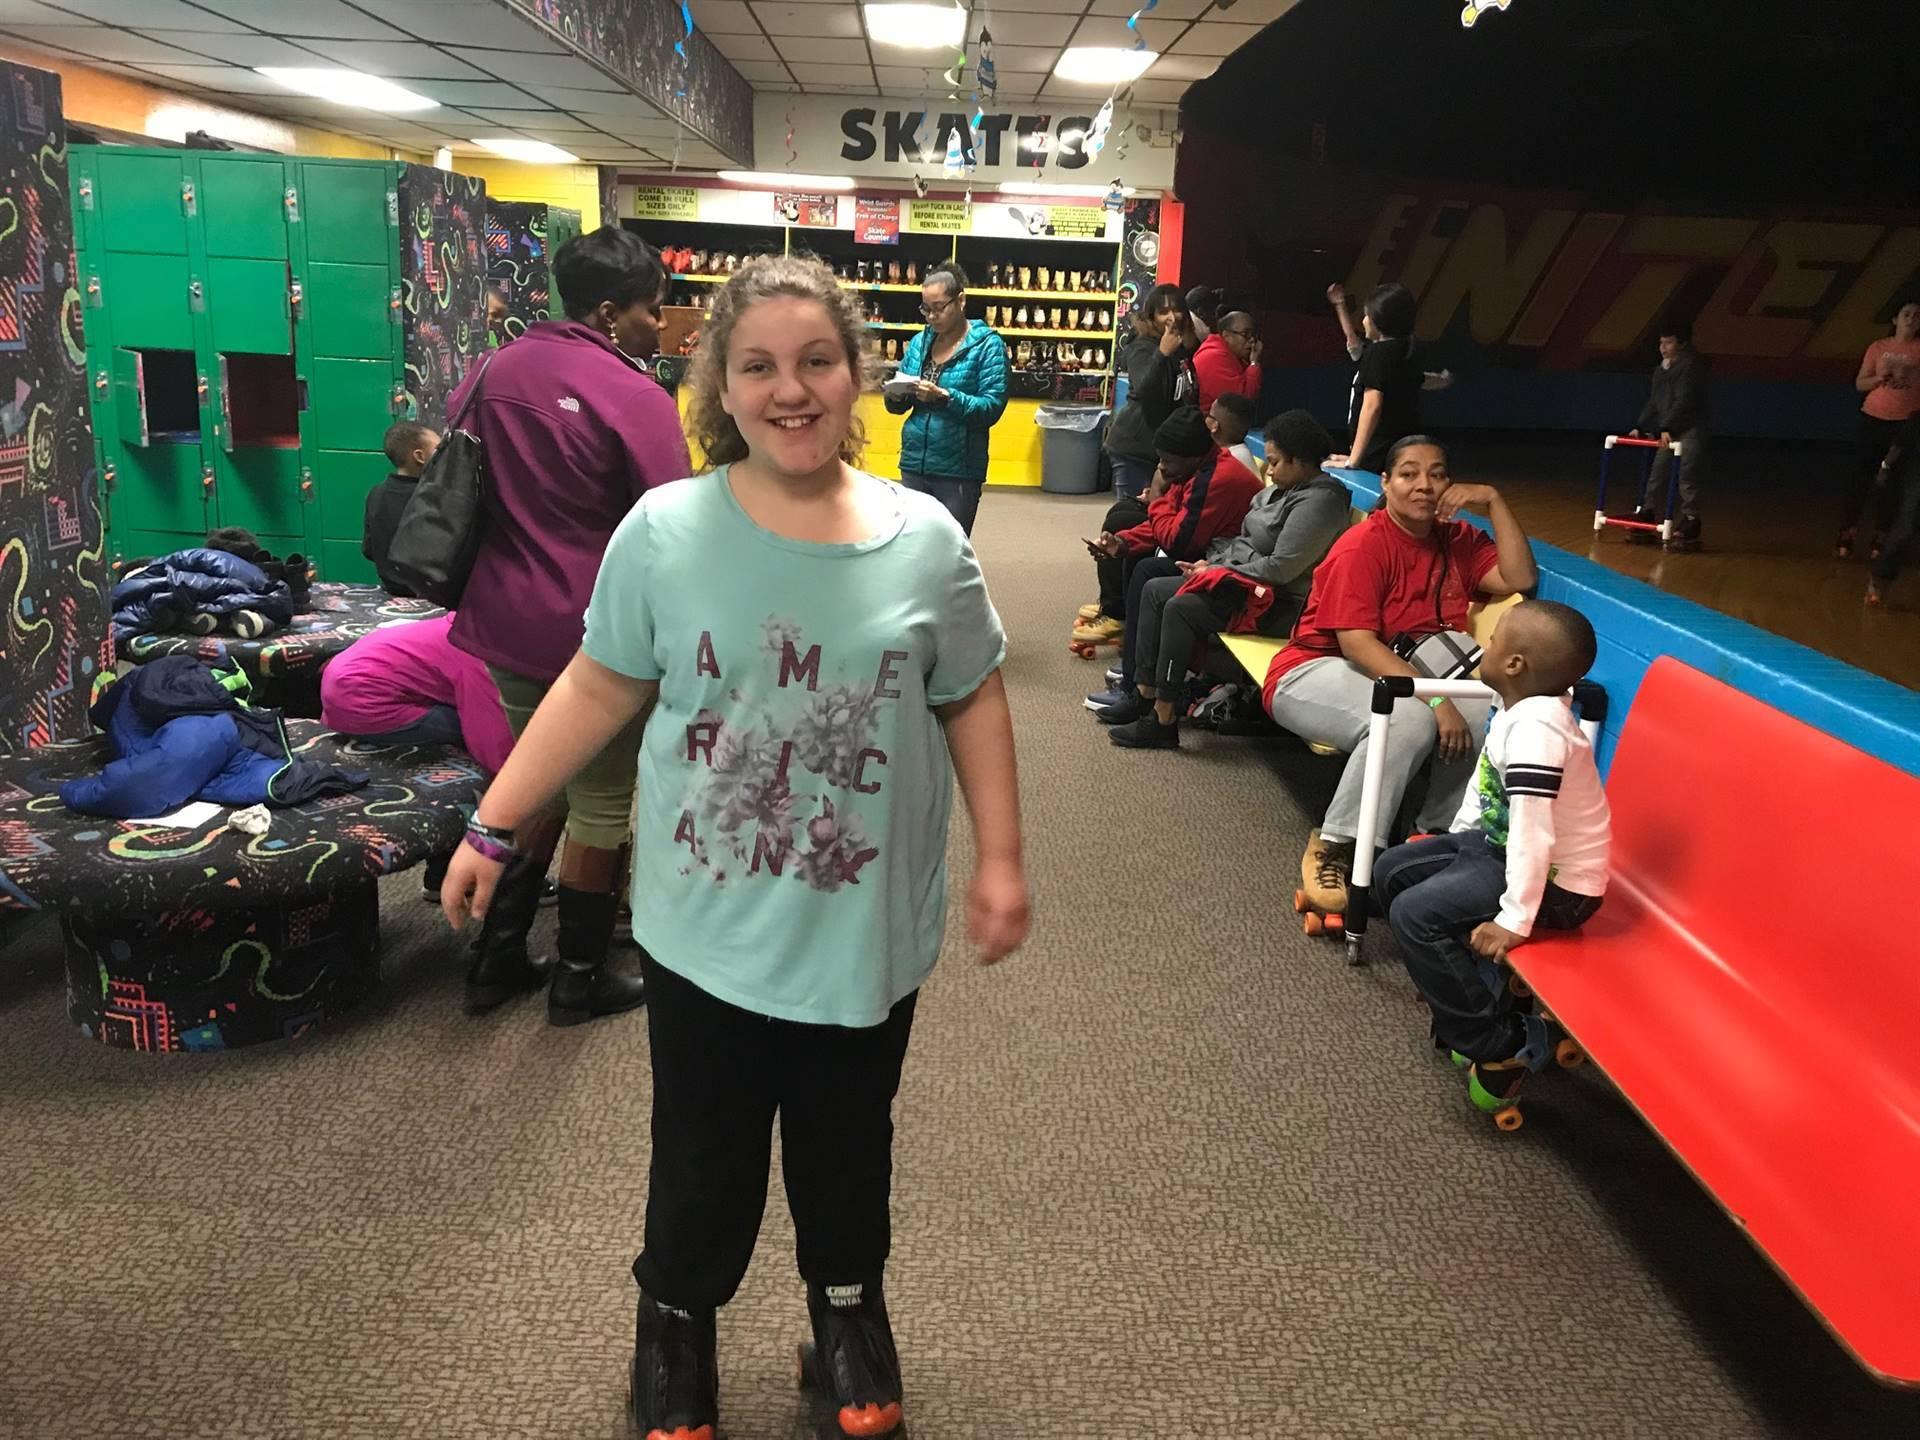 student in roller-skates